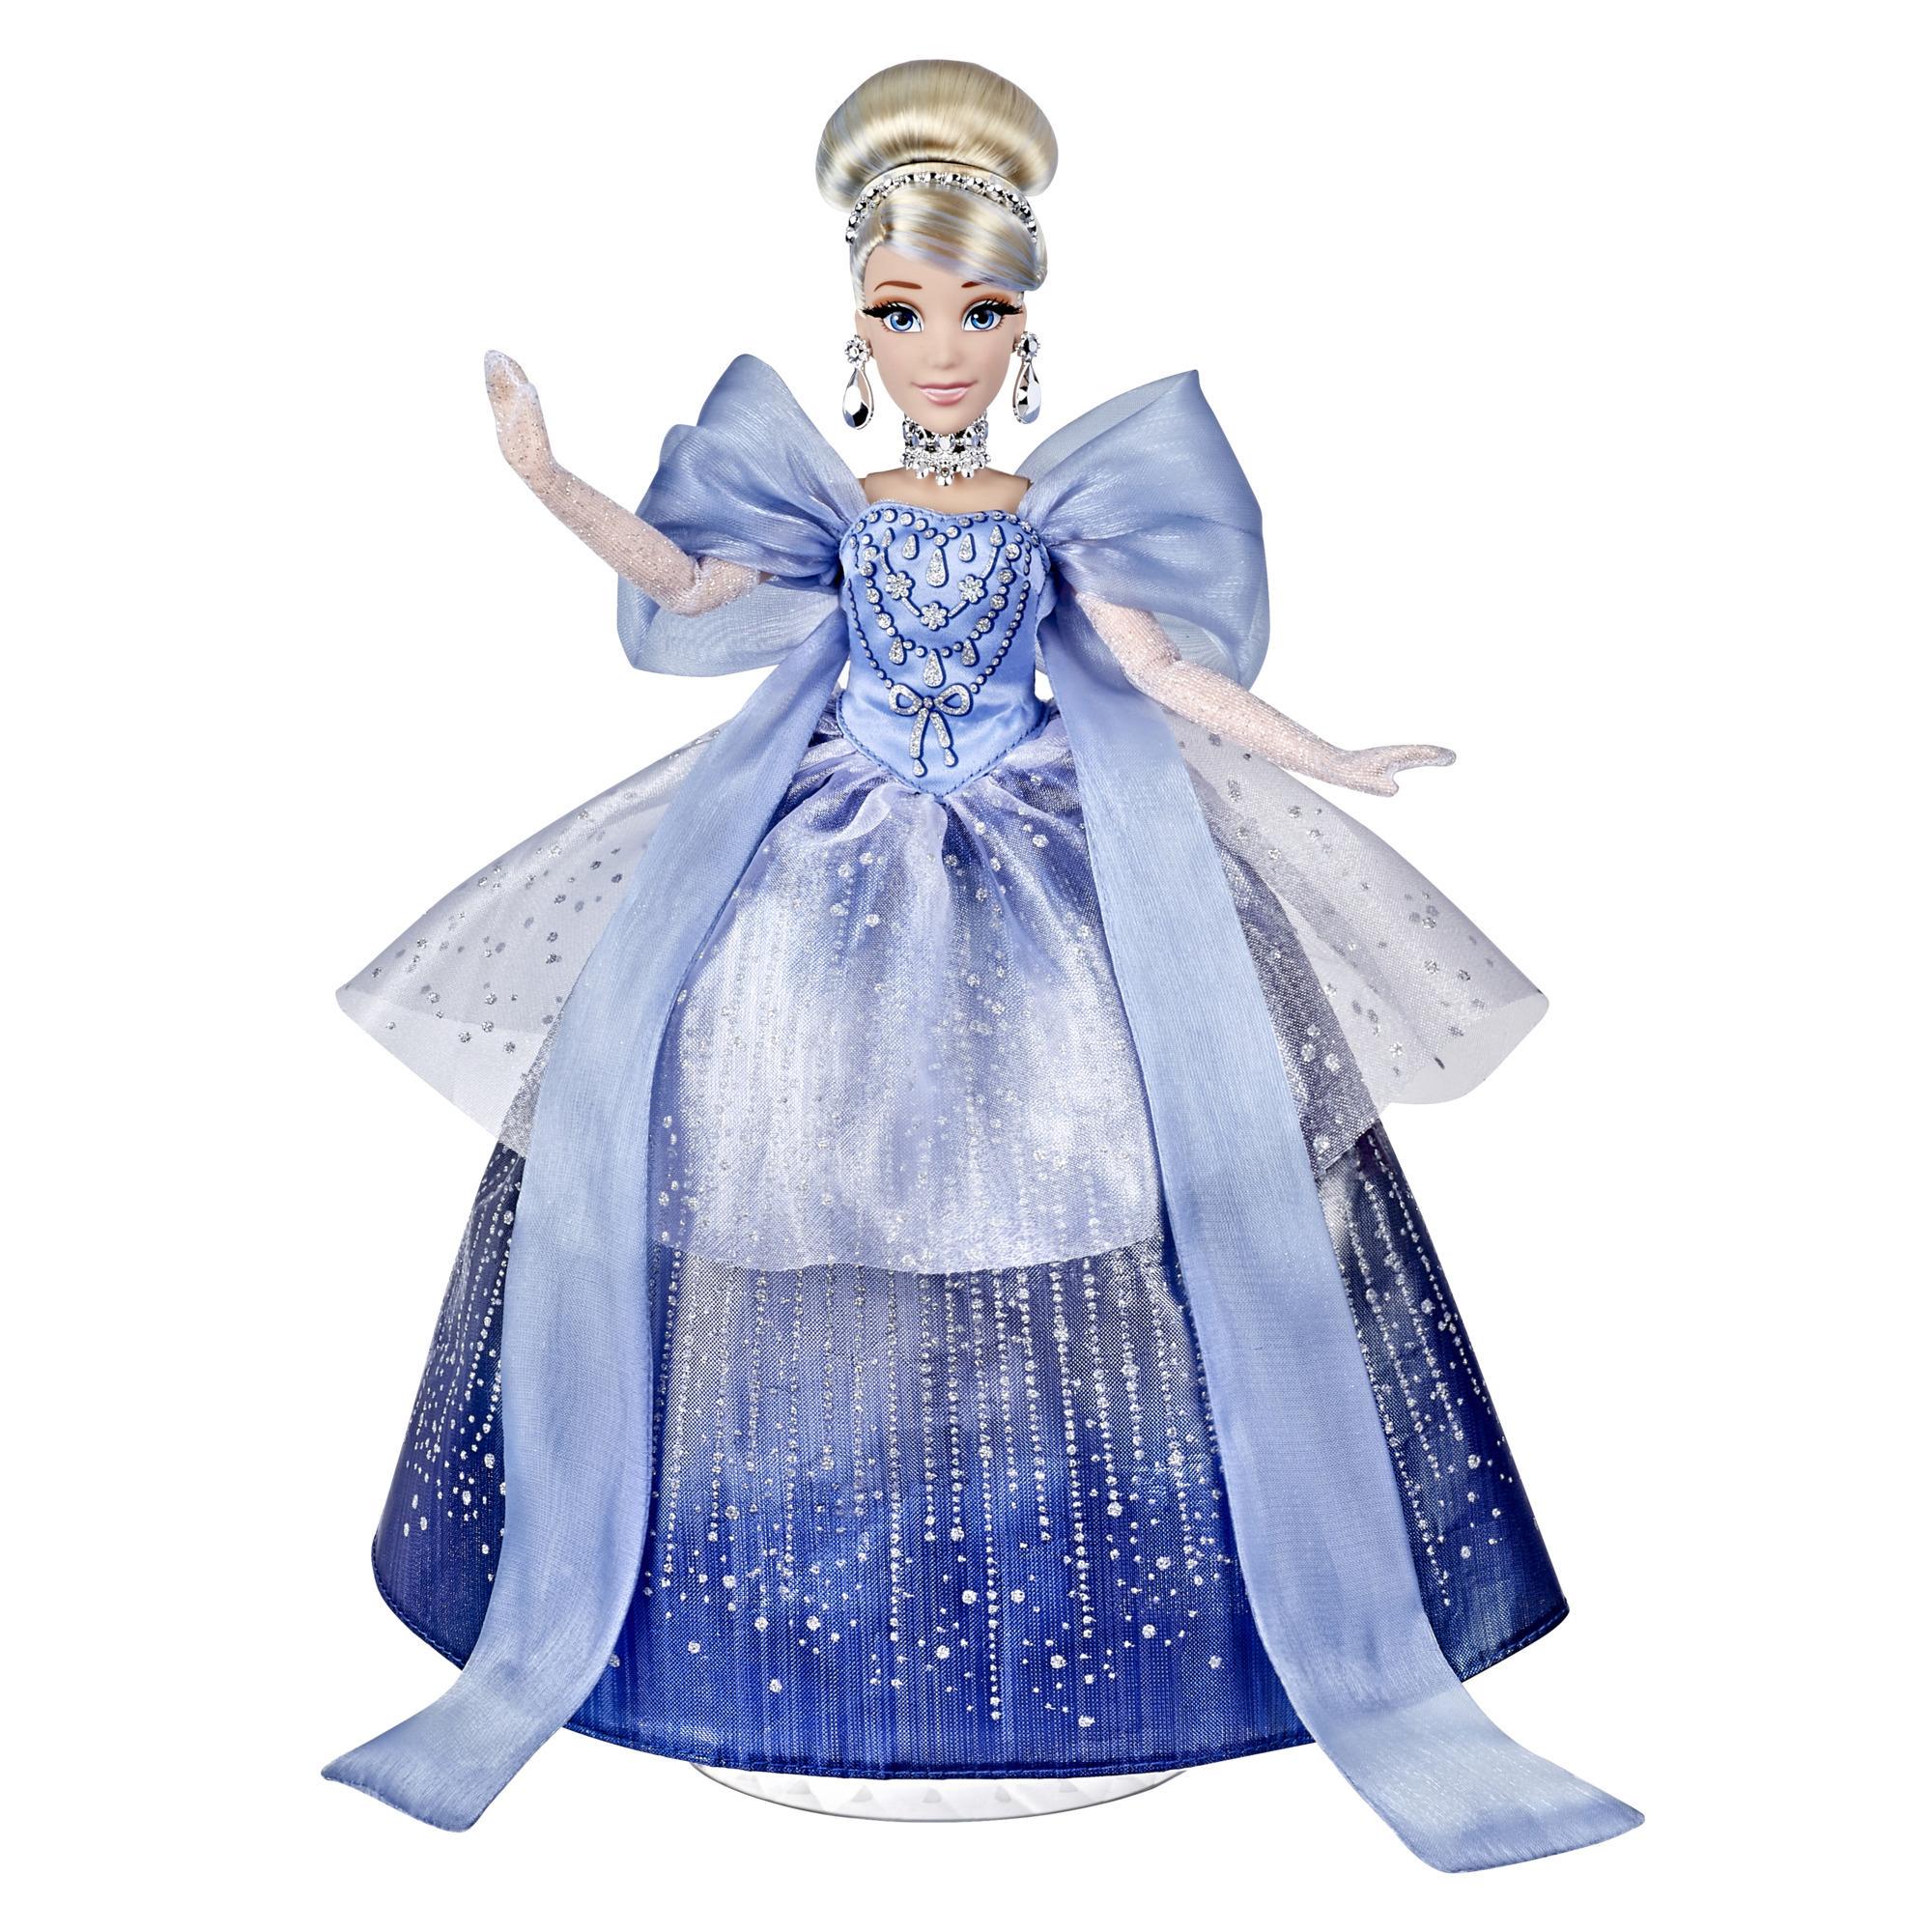 Disney Princess Style Series Holiday Style Cinderella, Christmas 2020 Fashion Collector Doll, legetøj til børn fra 6år